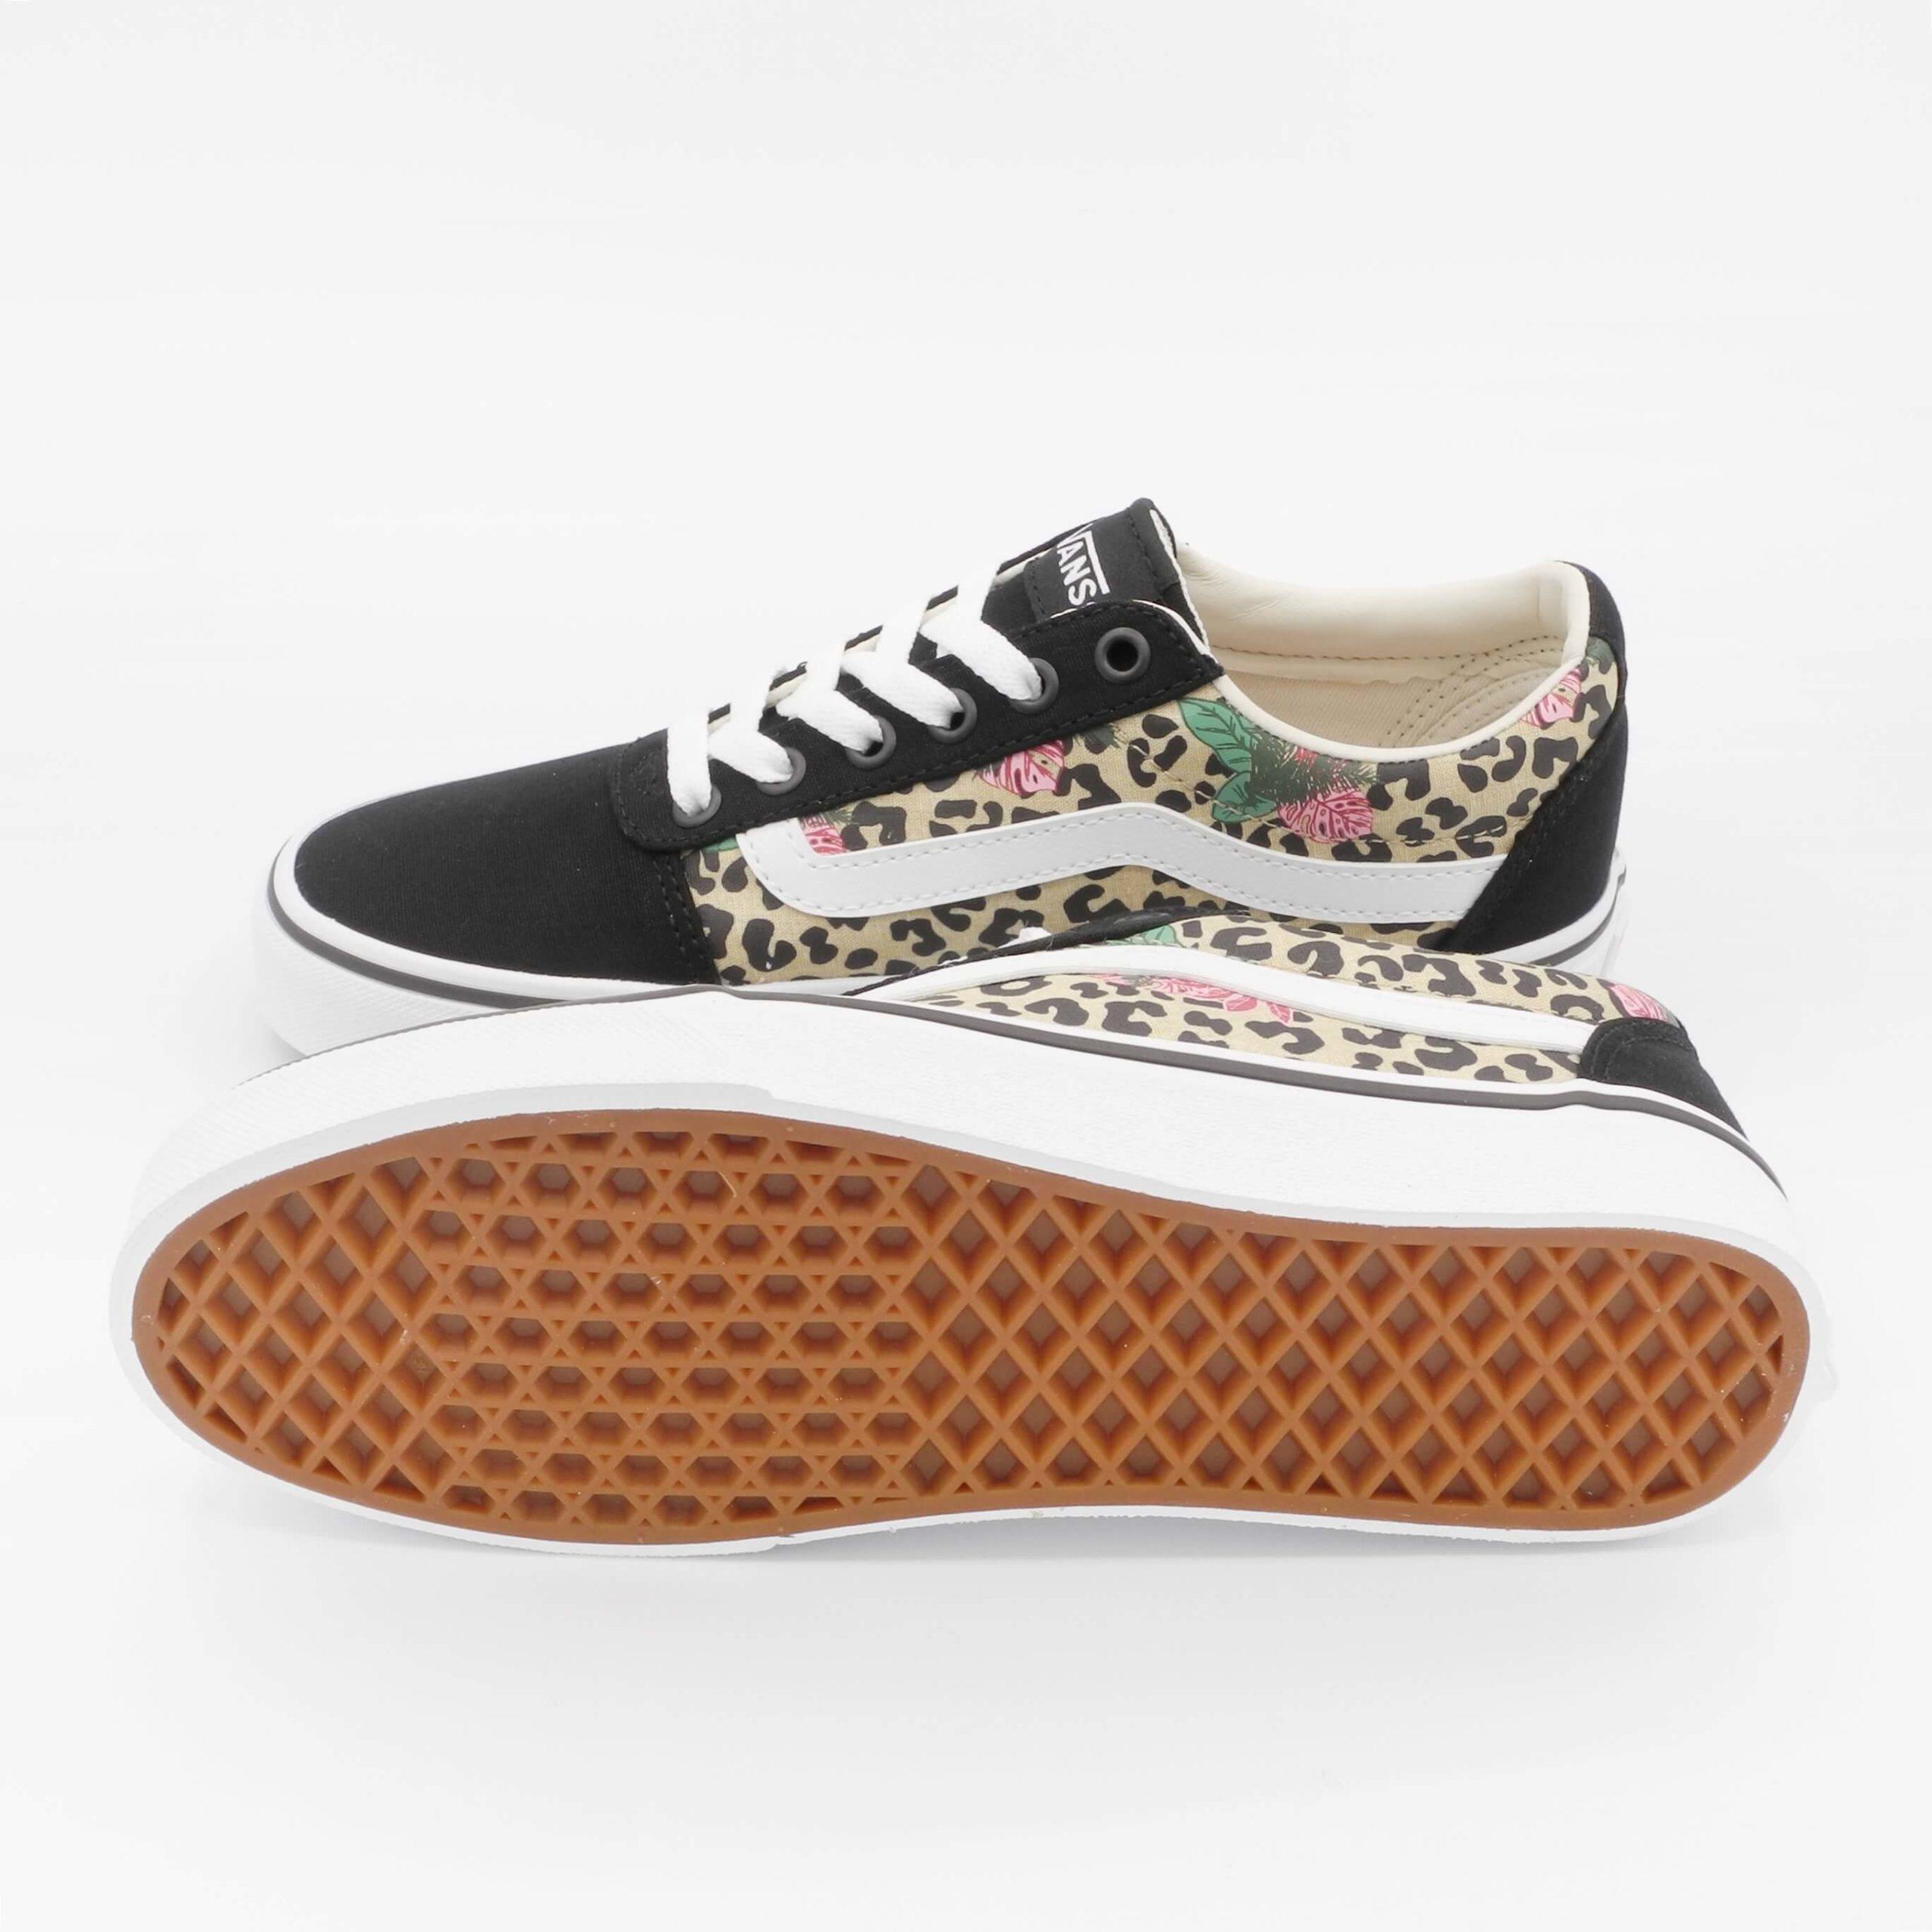 Sneakers donna VANS WARD (Cheetah palms) in Canvas Leopardato Nero